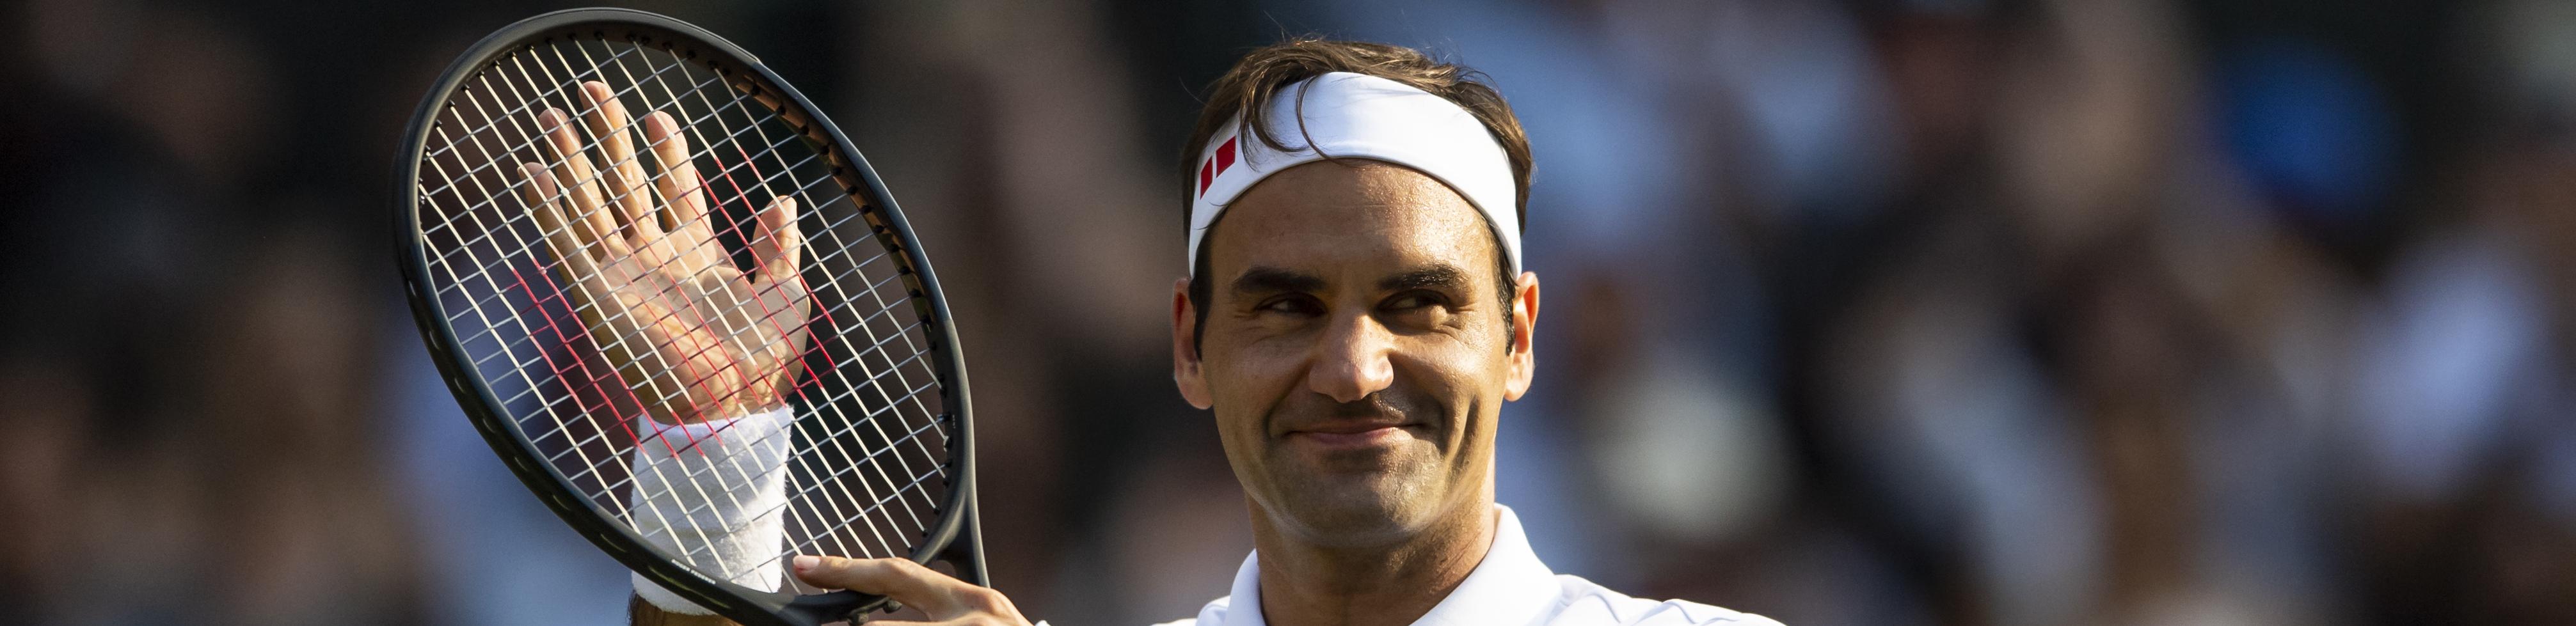 Pronostici Wimbledon 2019, day 11: Federer-Nadal, da quale parte pende la bilancia stavolta?